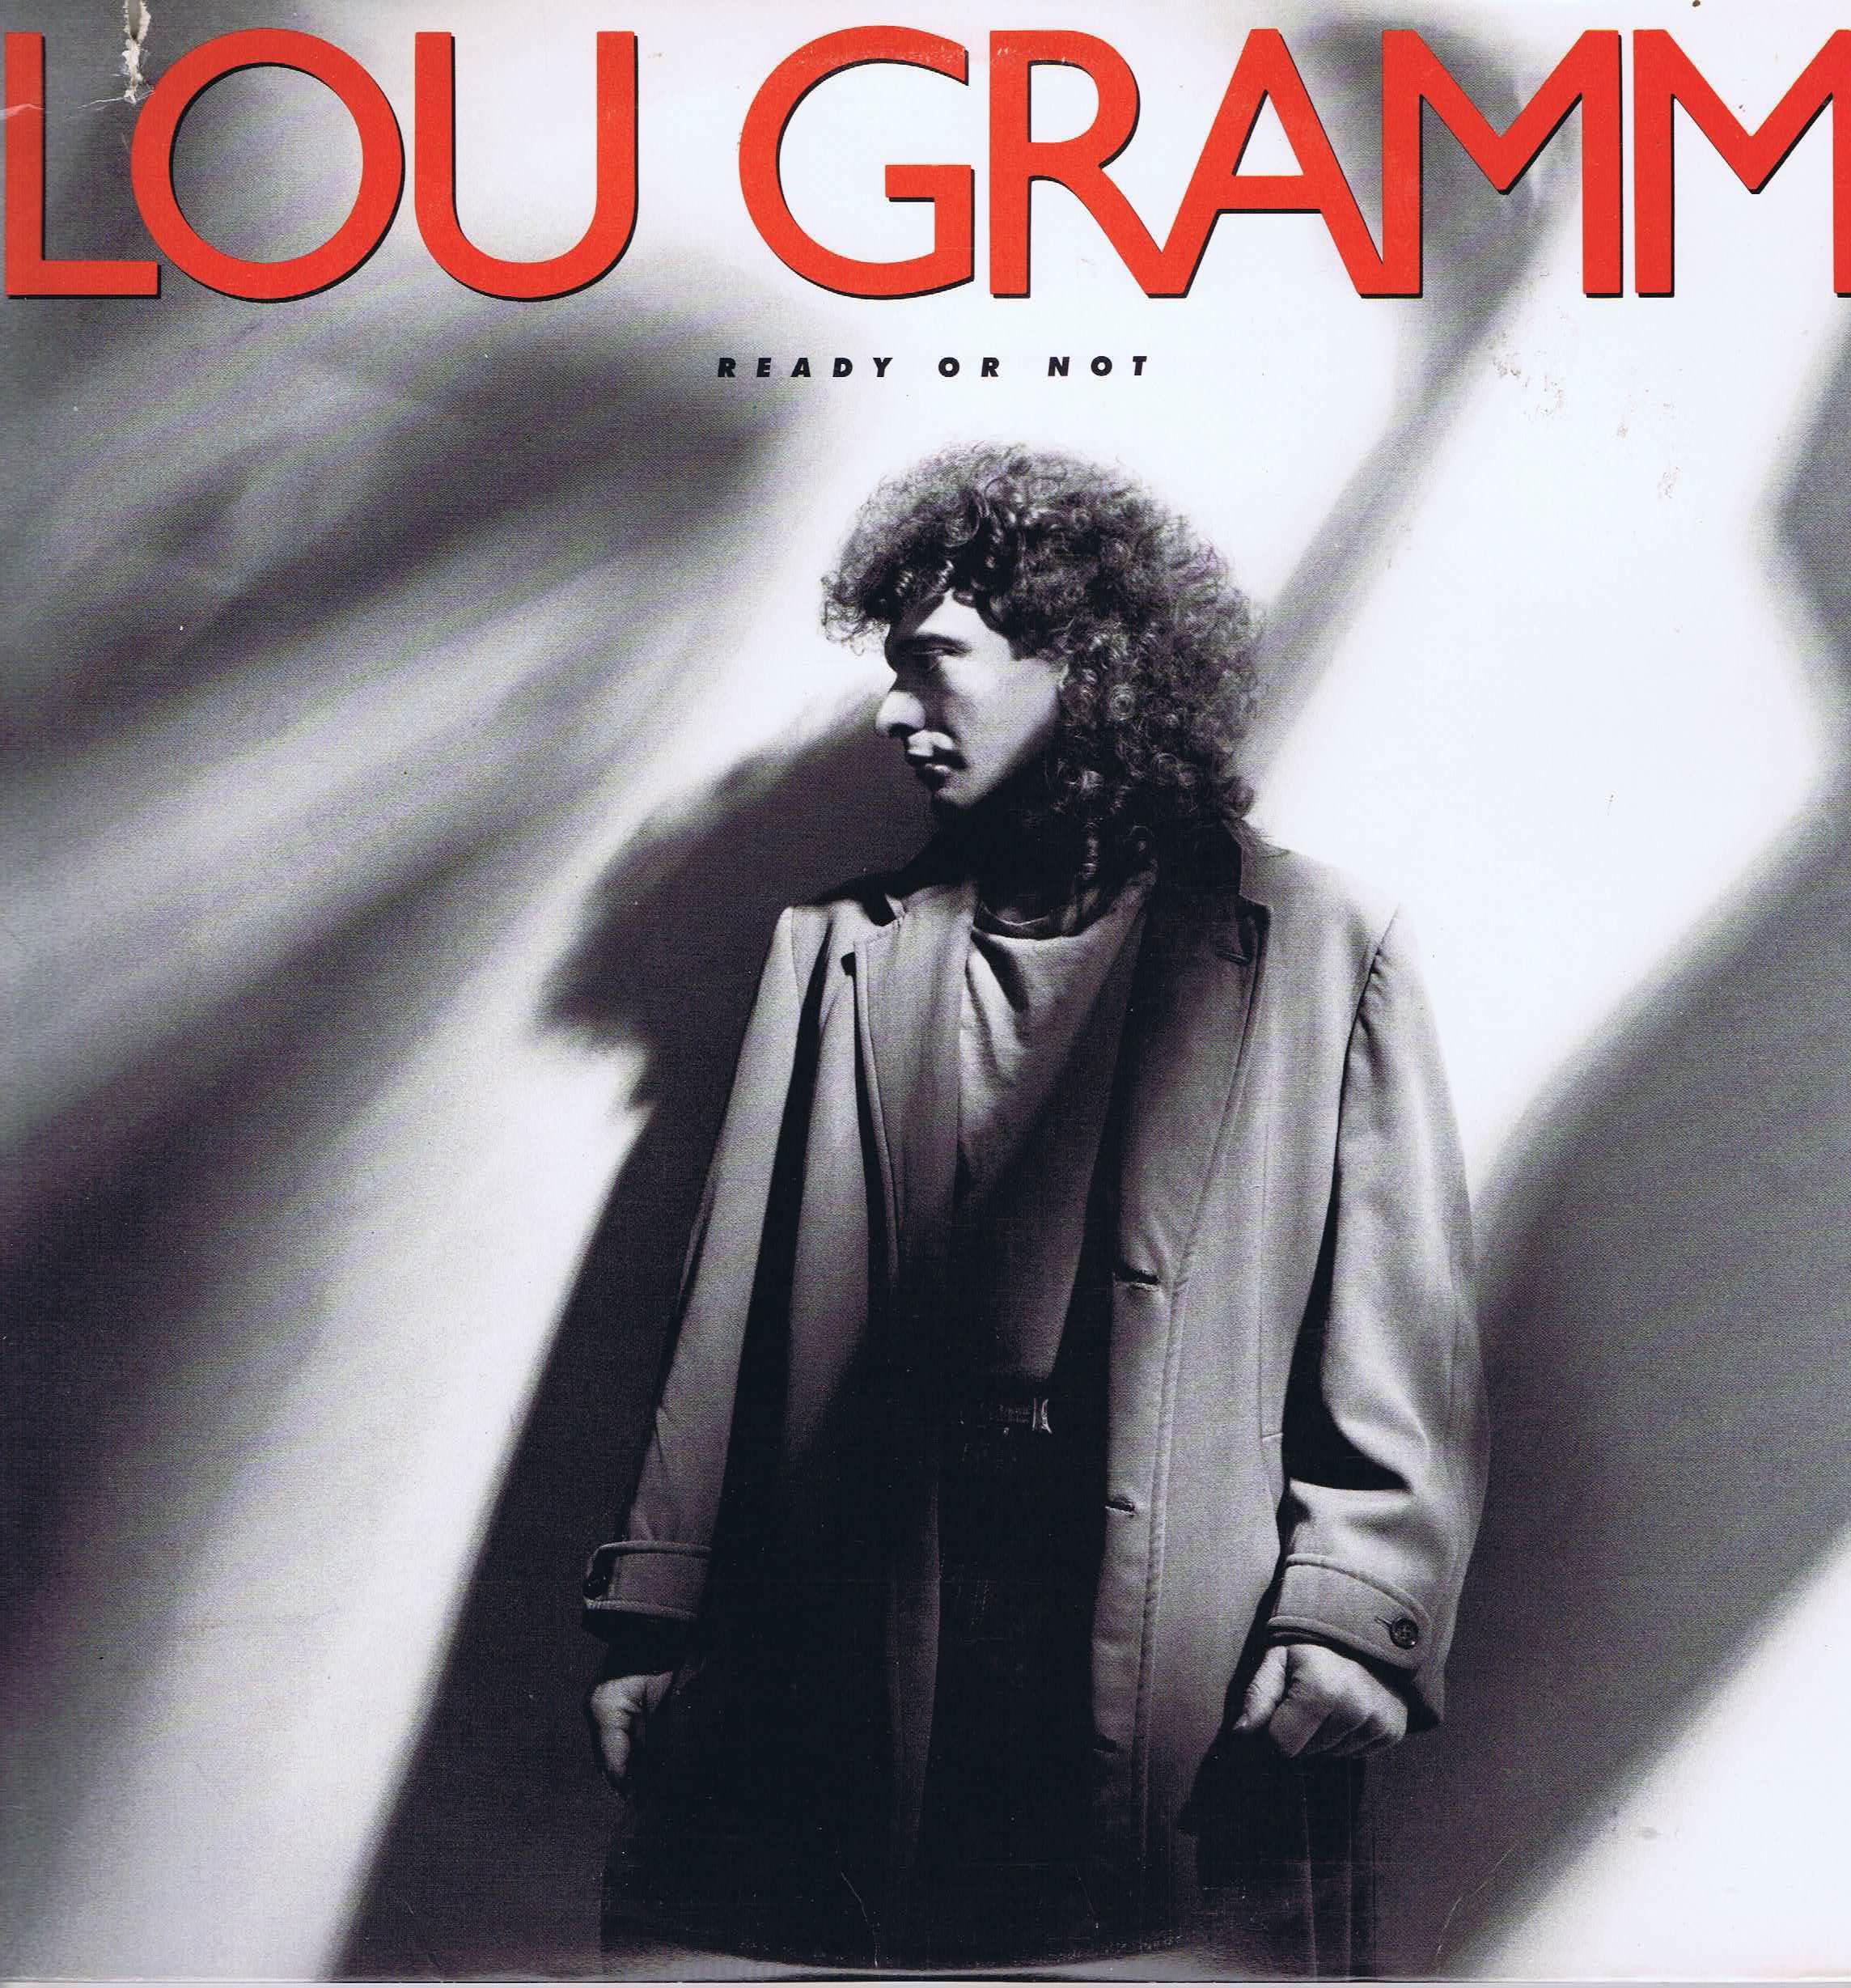 Lou Gramm – Ready Or Not - Atlantic 81728-1 - LP Vinyl Record